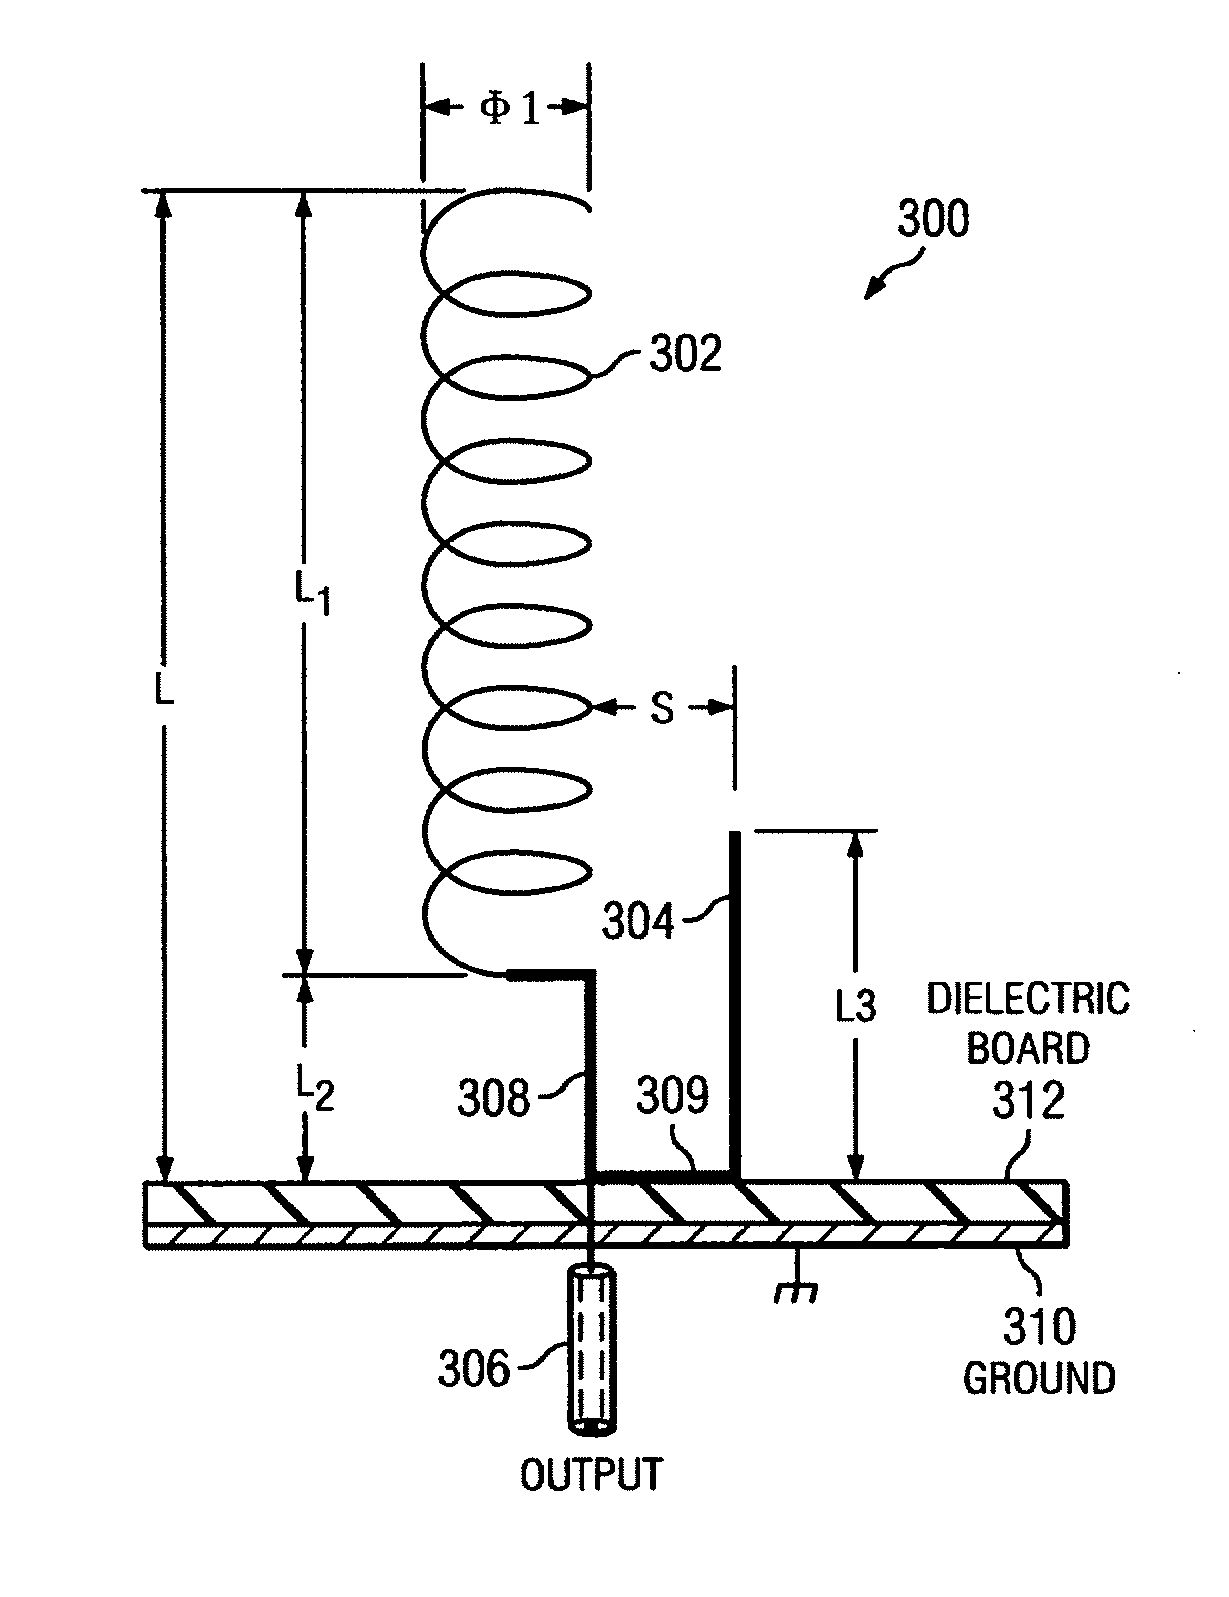 tags: #hdmi to micro usb wiring diagram#hdmi tv cables diagrams#hdmi pinout  diagram#hdmi pinout wiring diagram#hdmi schematic diagram#hdmi cable  connection